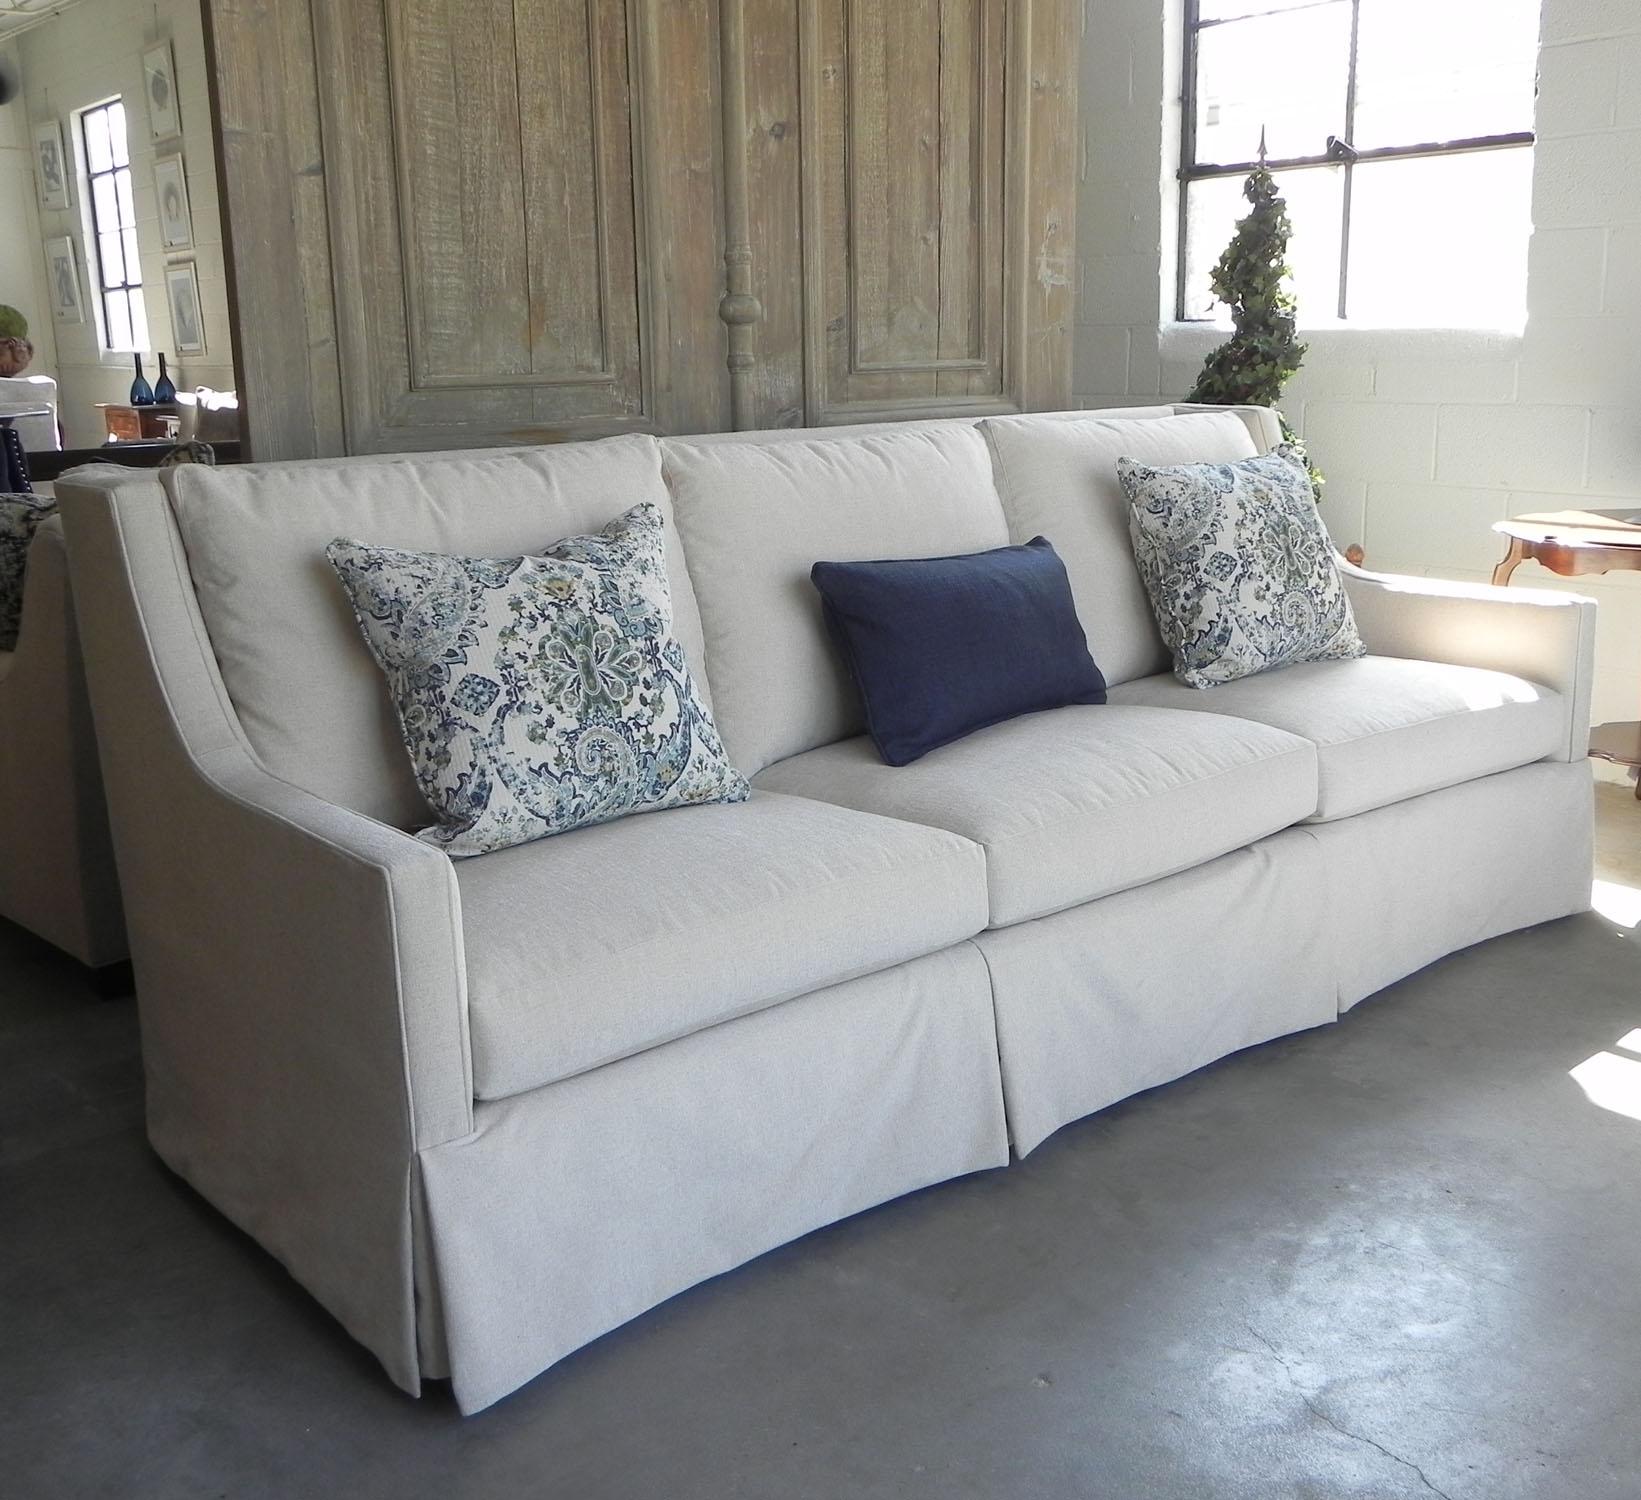 sofa sfc roche bobois mah jong preis greer